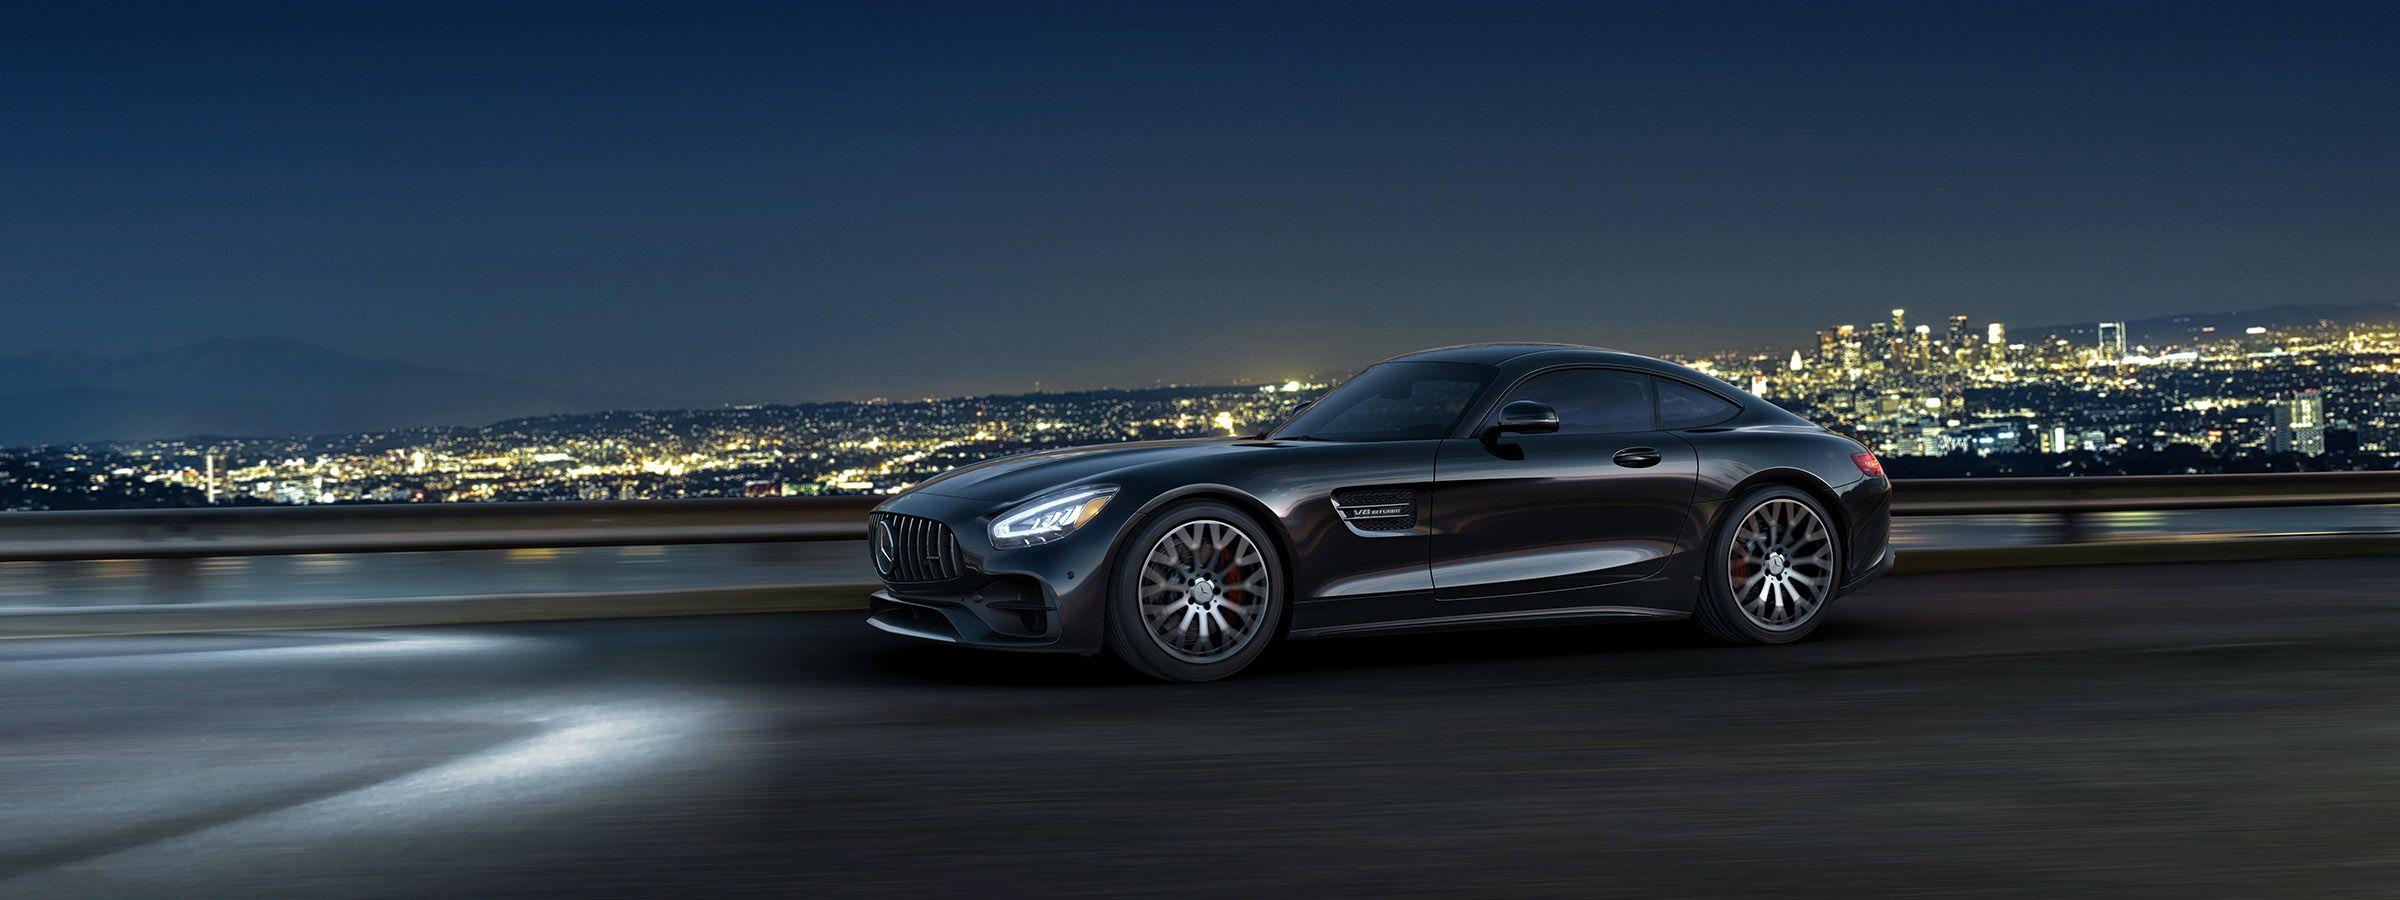 2021 Mercedes-Benz AMG GT Banner